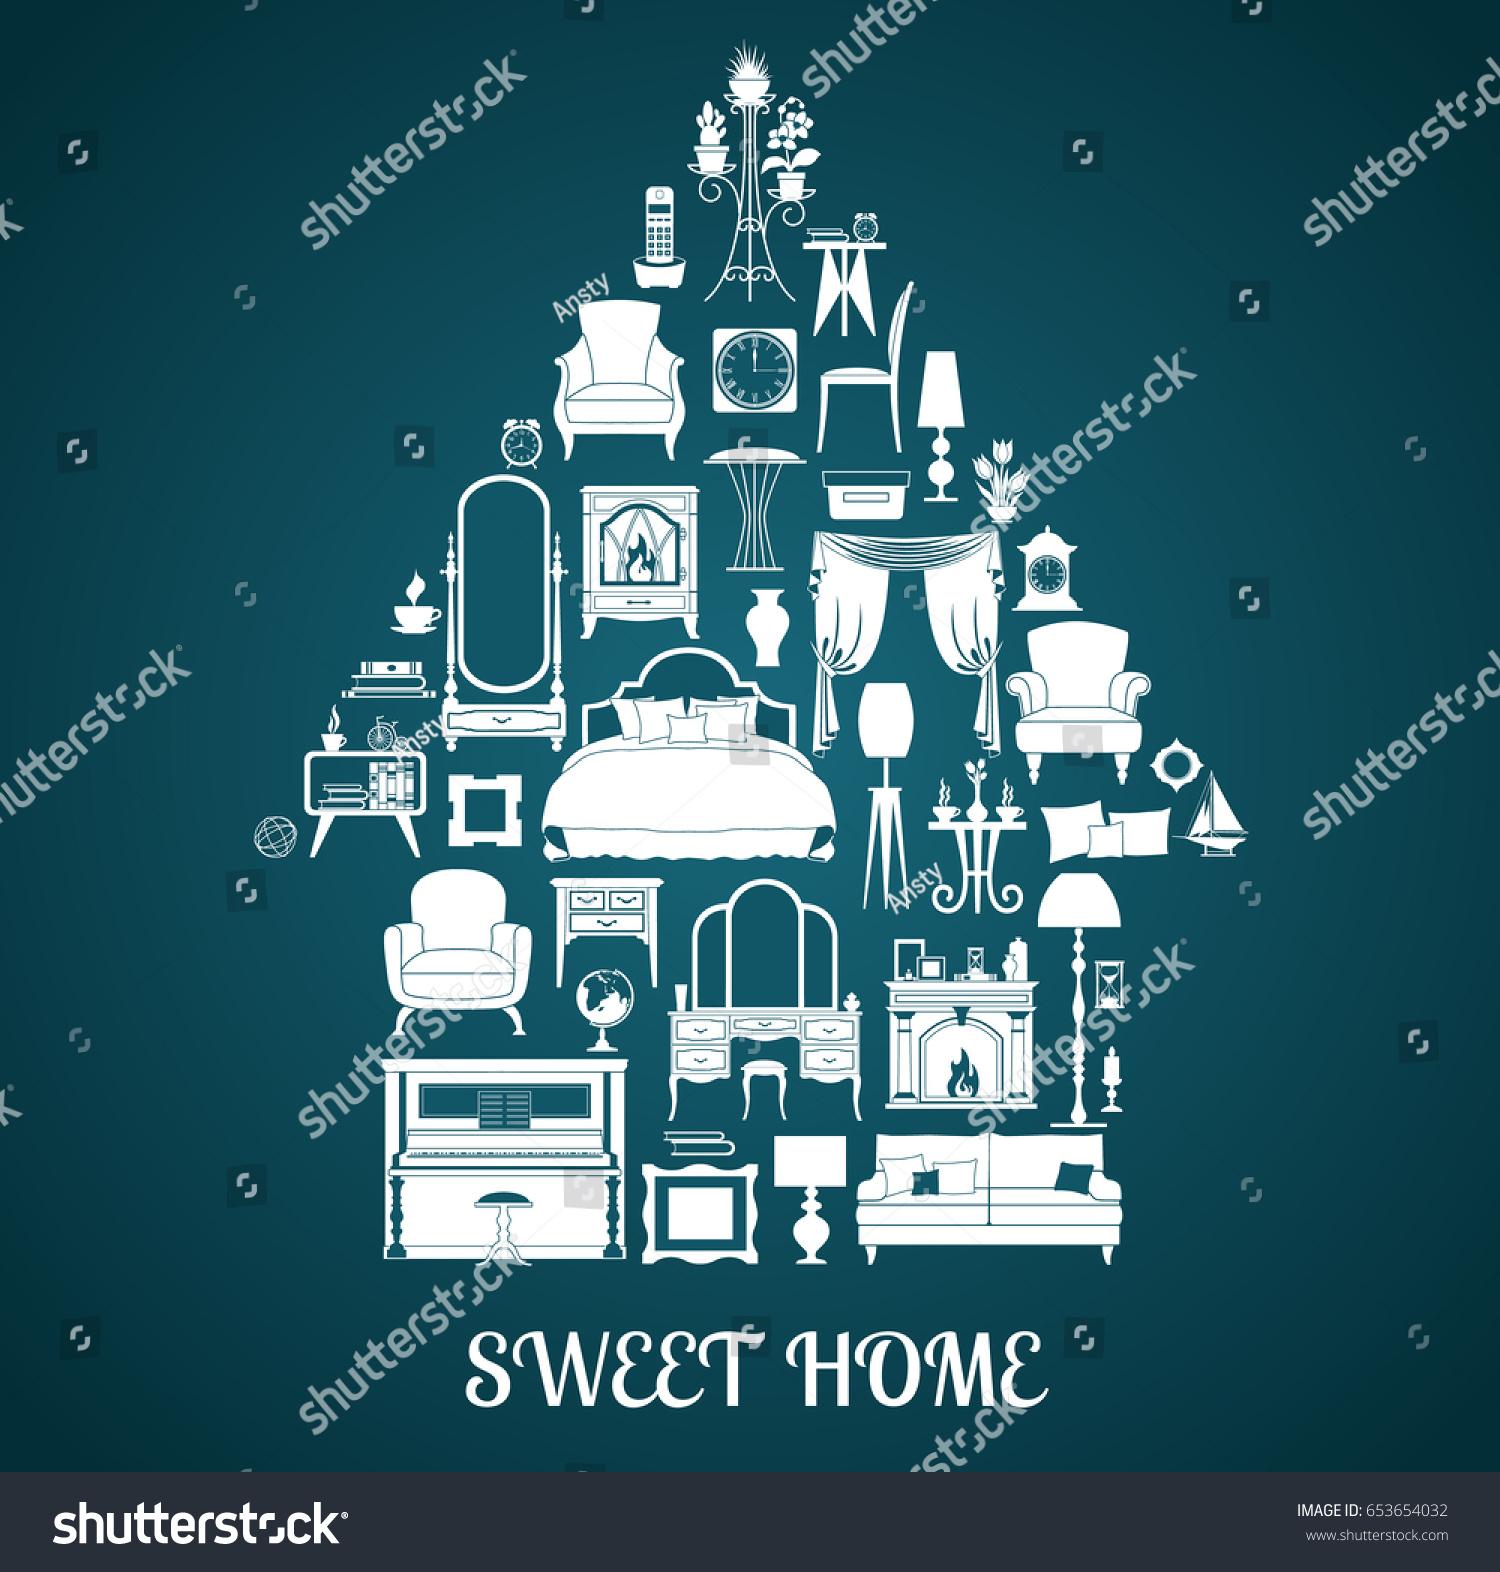 Silhouettes Furniture Interior Items Home Decor Stock Vector ...